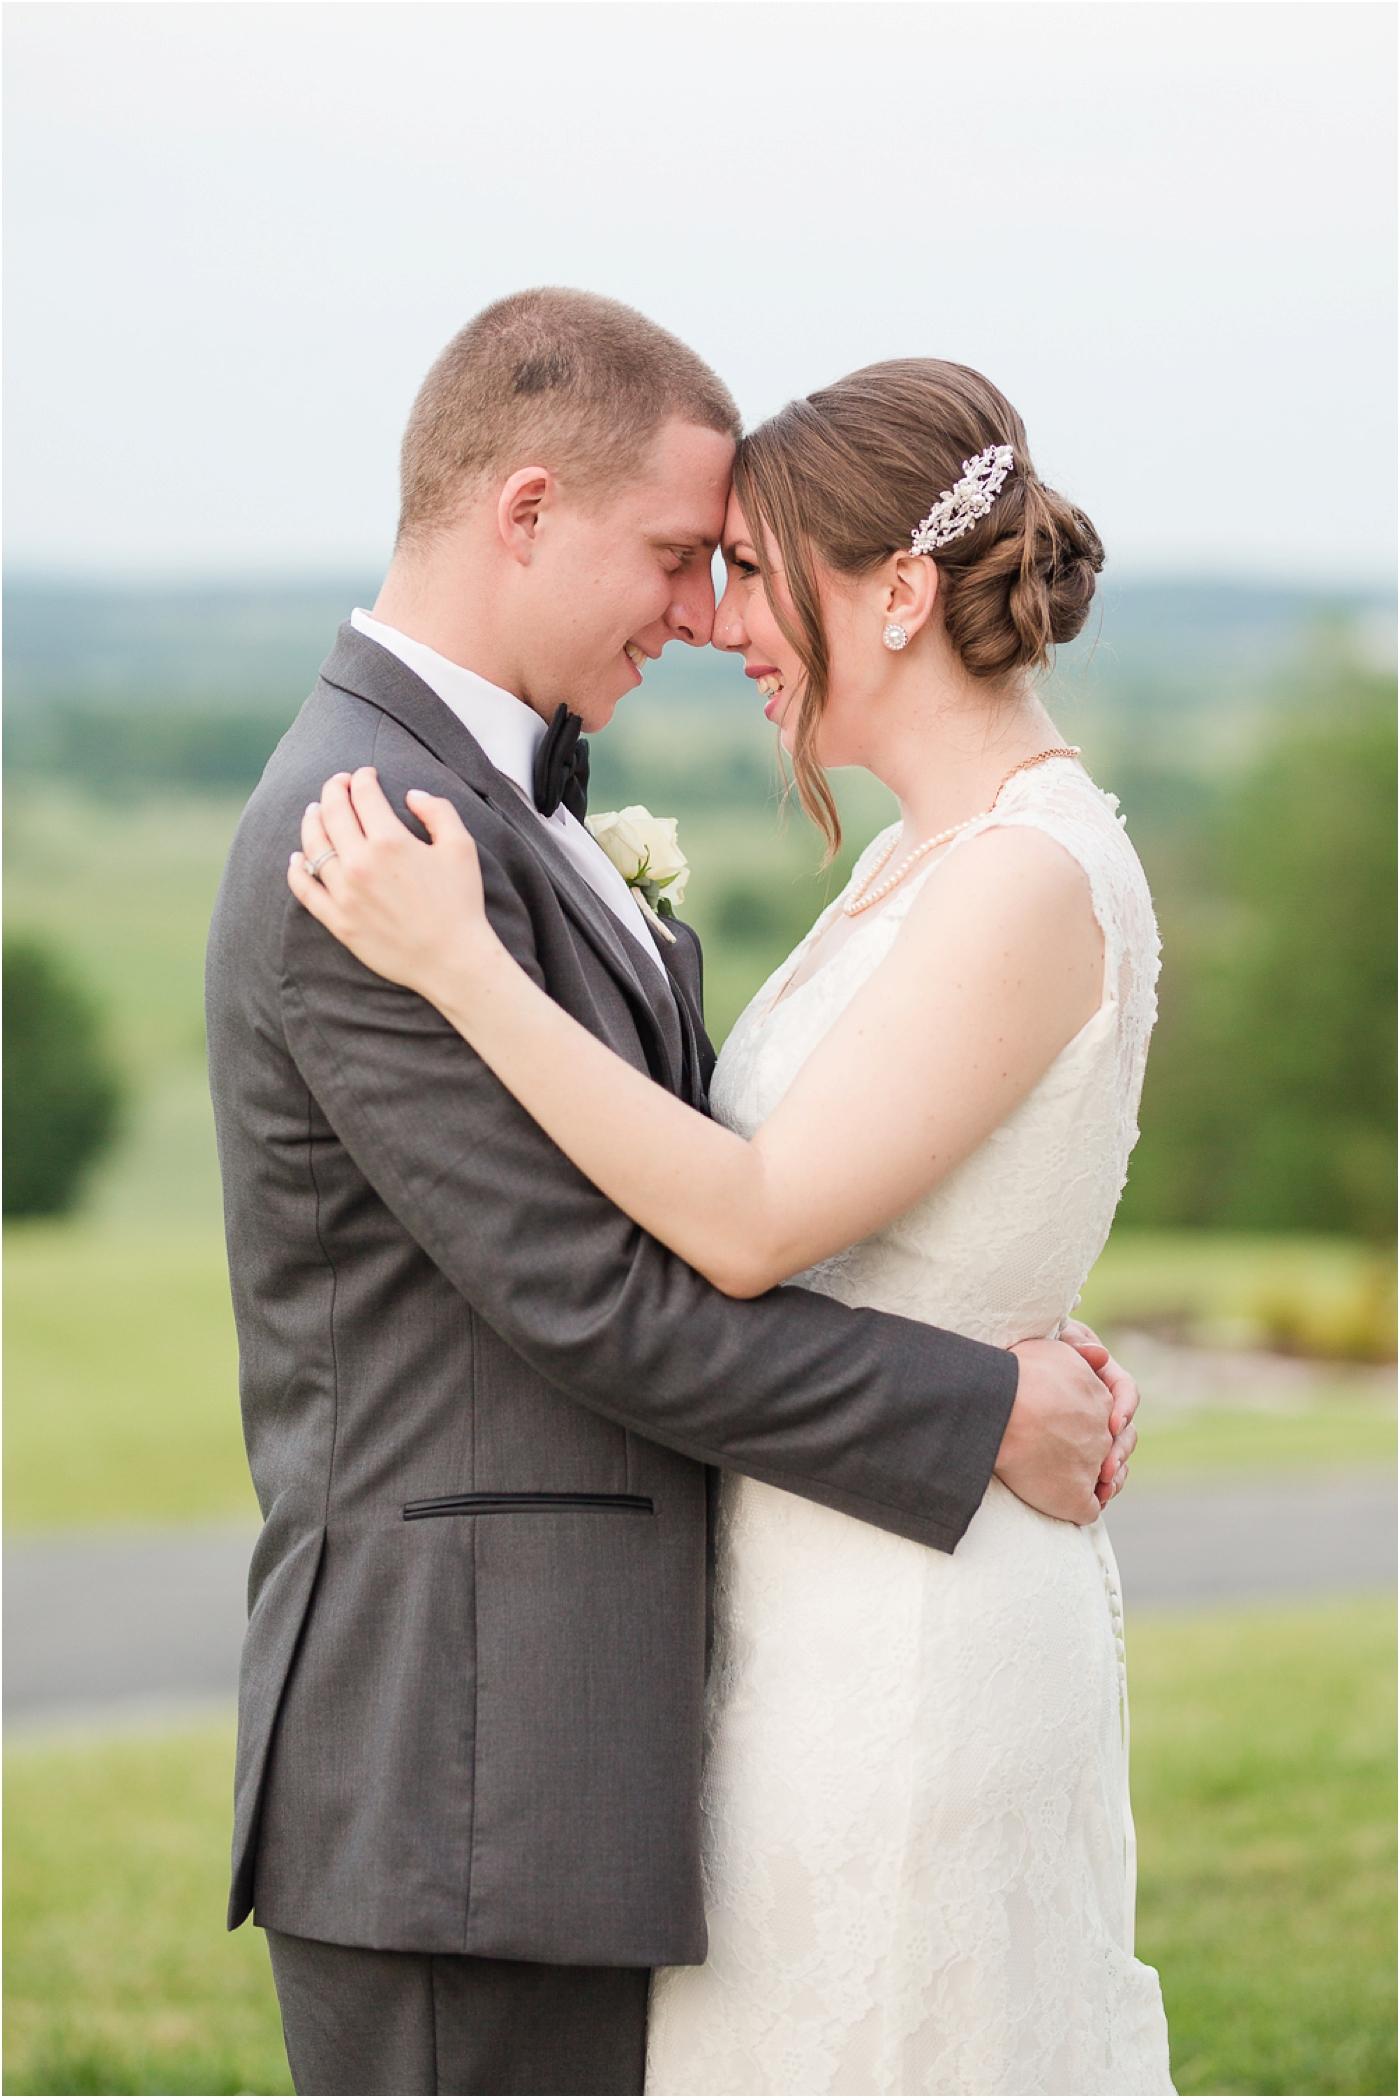 Gettysburg-lodges-wedding-photos-96.jpg